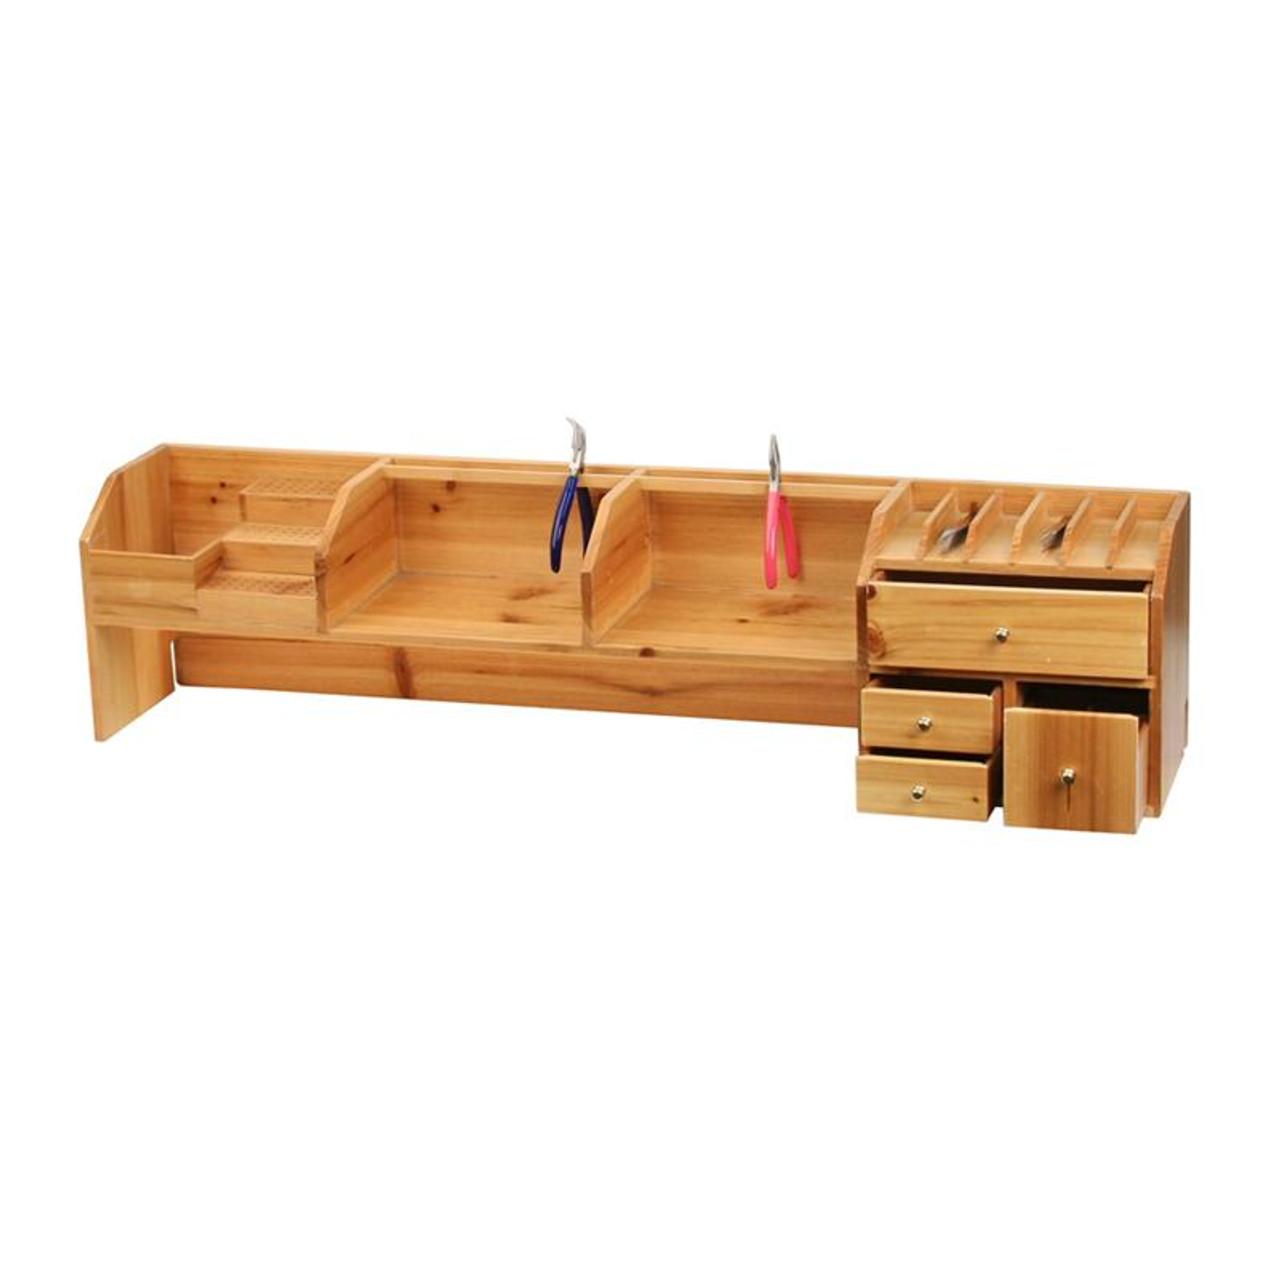 Fabulous Work Bench Jewelry Tool Organizer Bench Shelf Dailytribune Chair Design For Home Dailytribuneorg